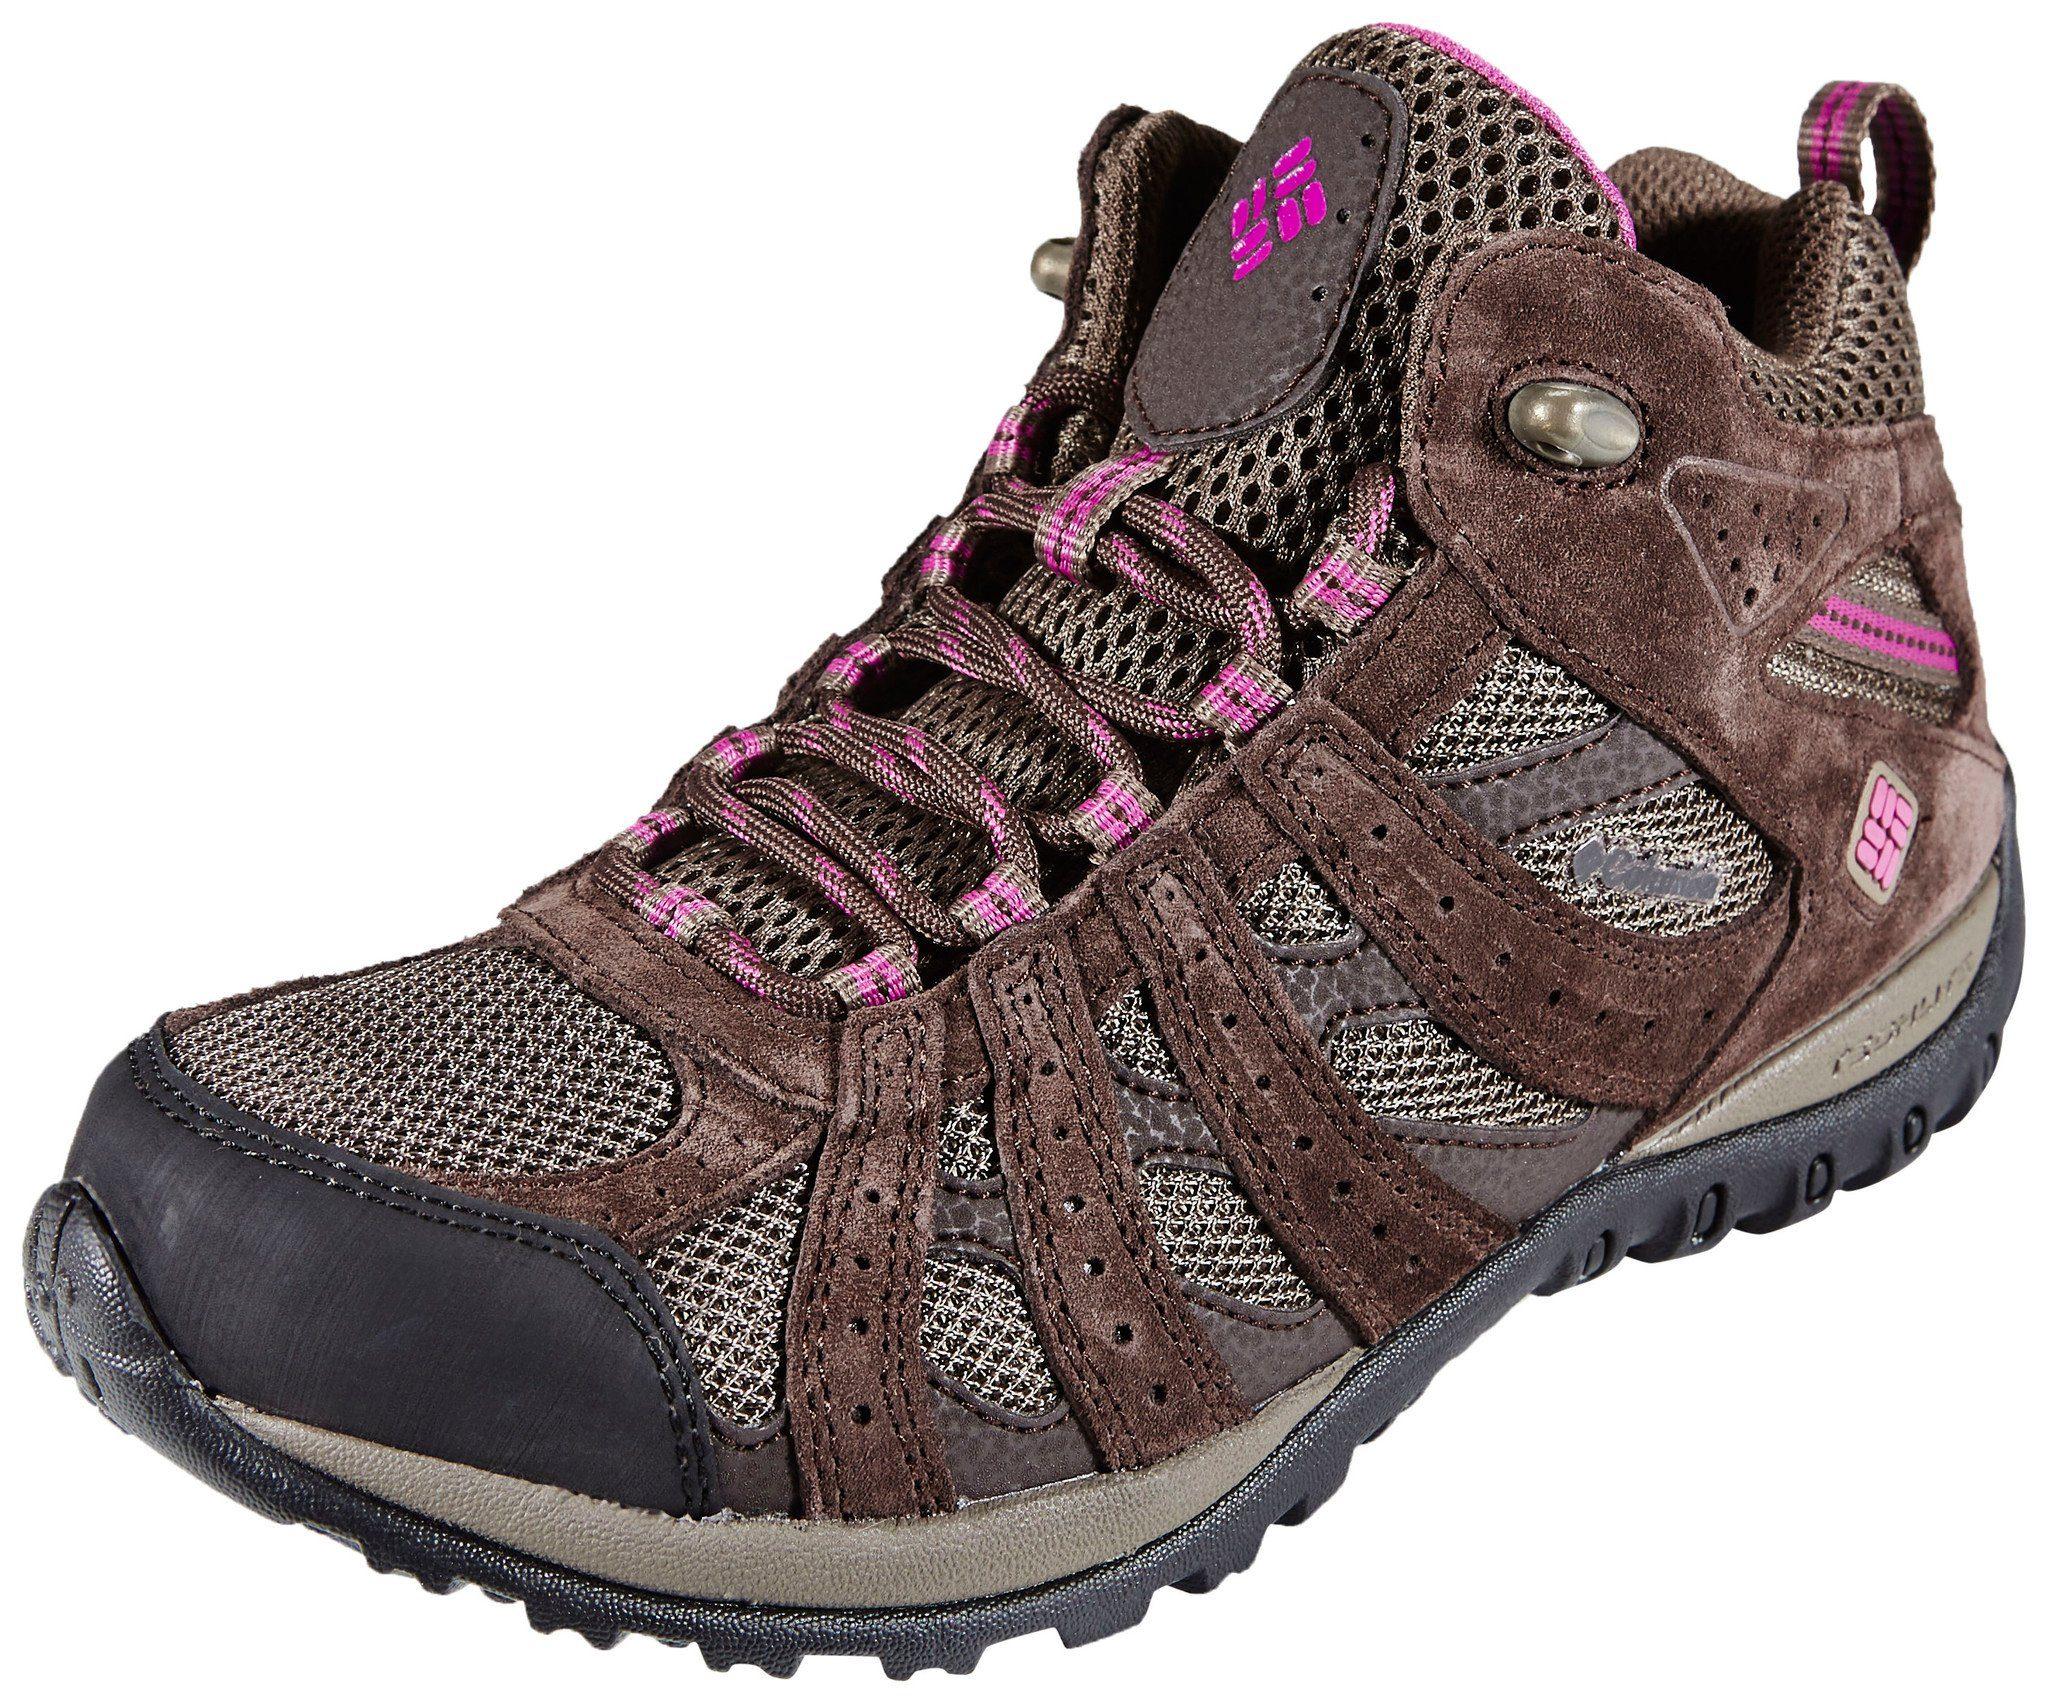 Columbia Kletterschuh »Redmond Shoes Women Mid WP«, braun, braun